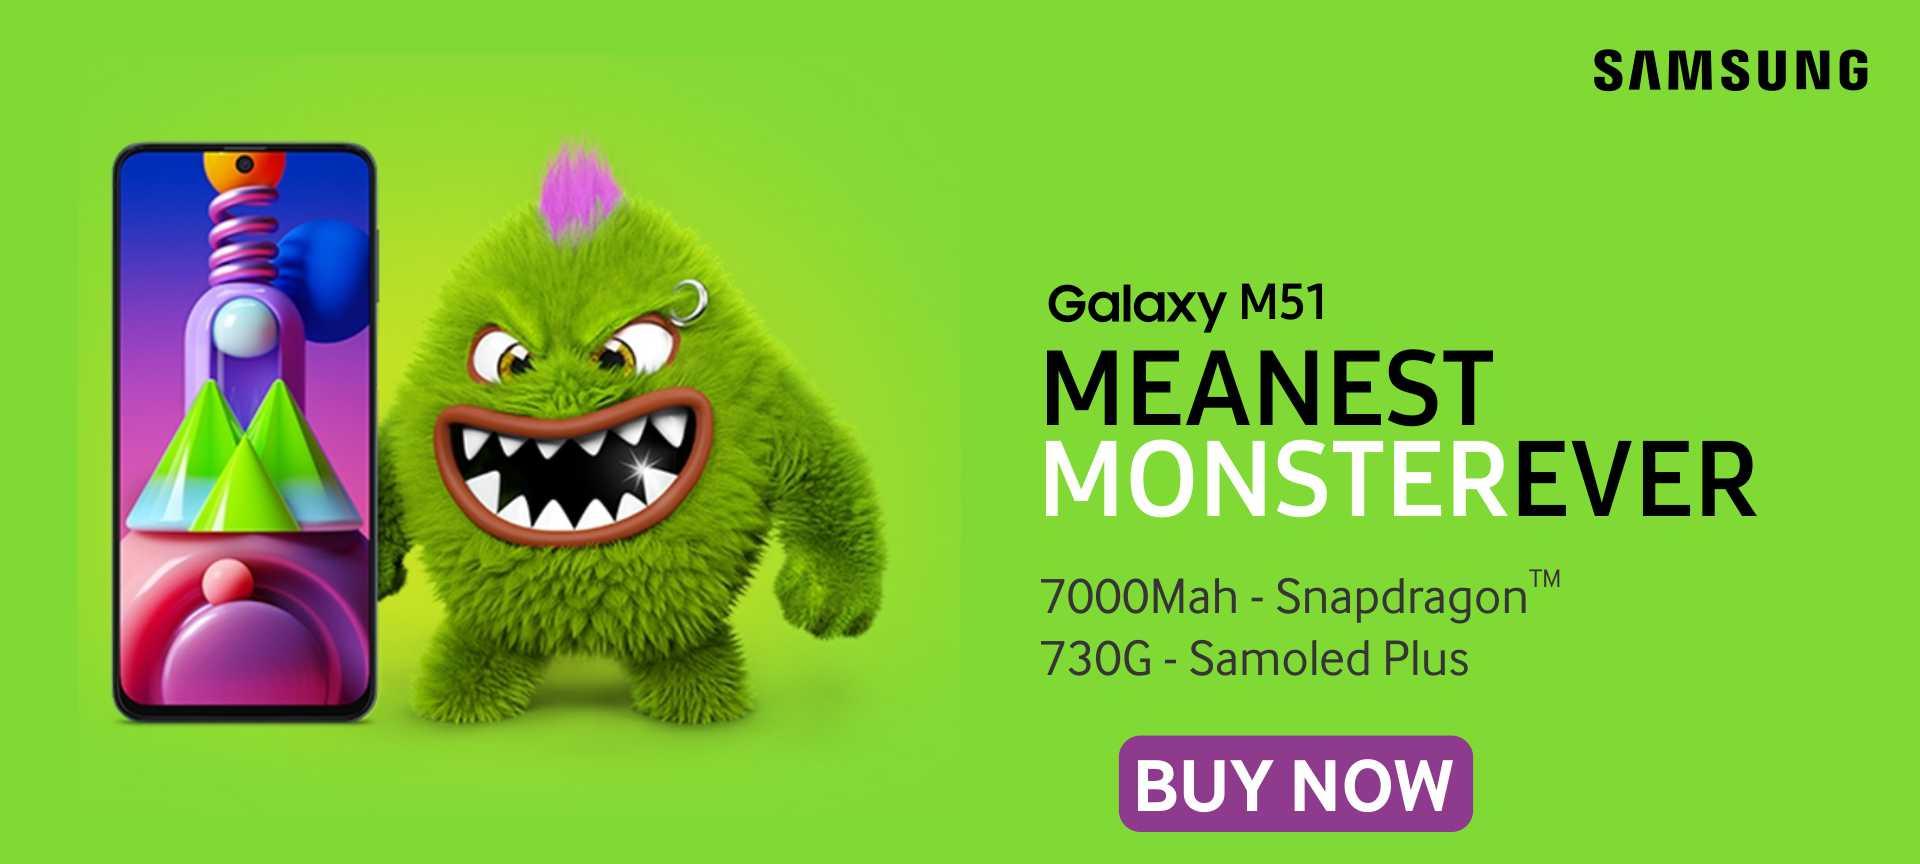 galaxy-m51